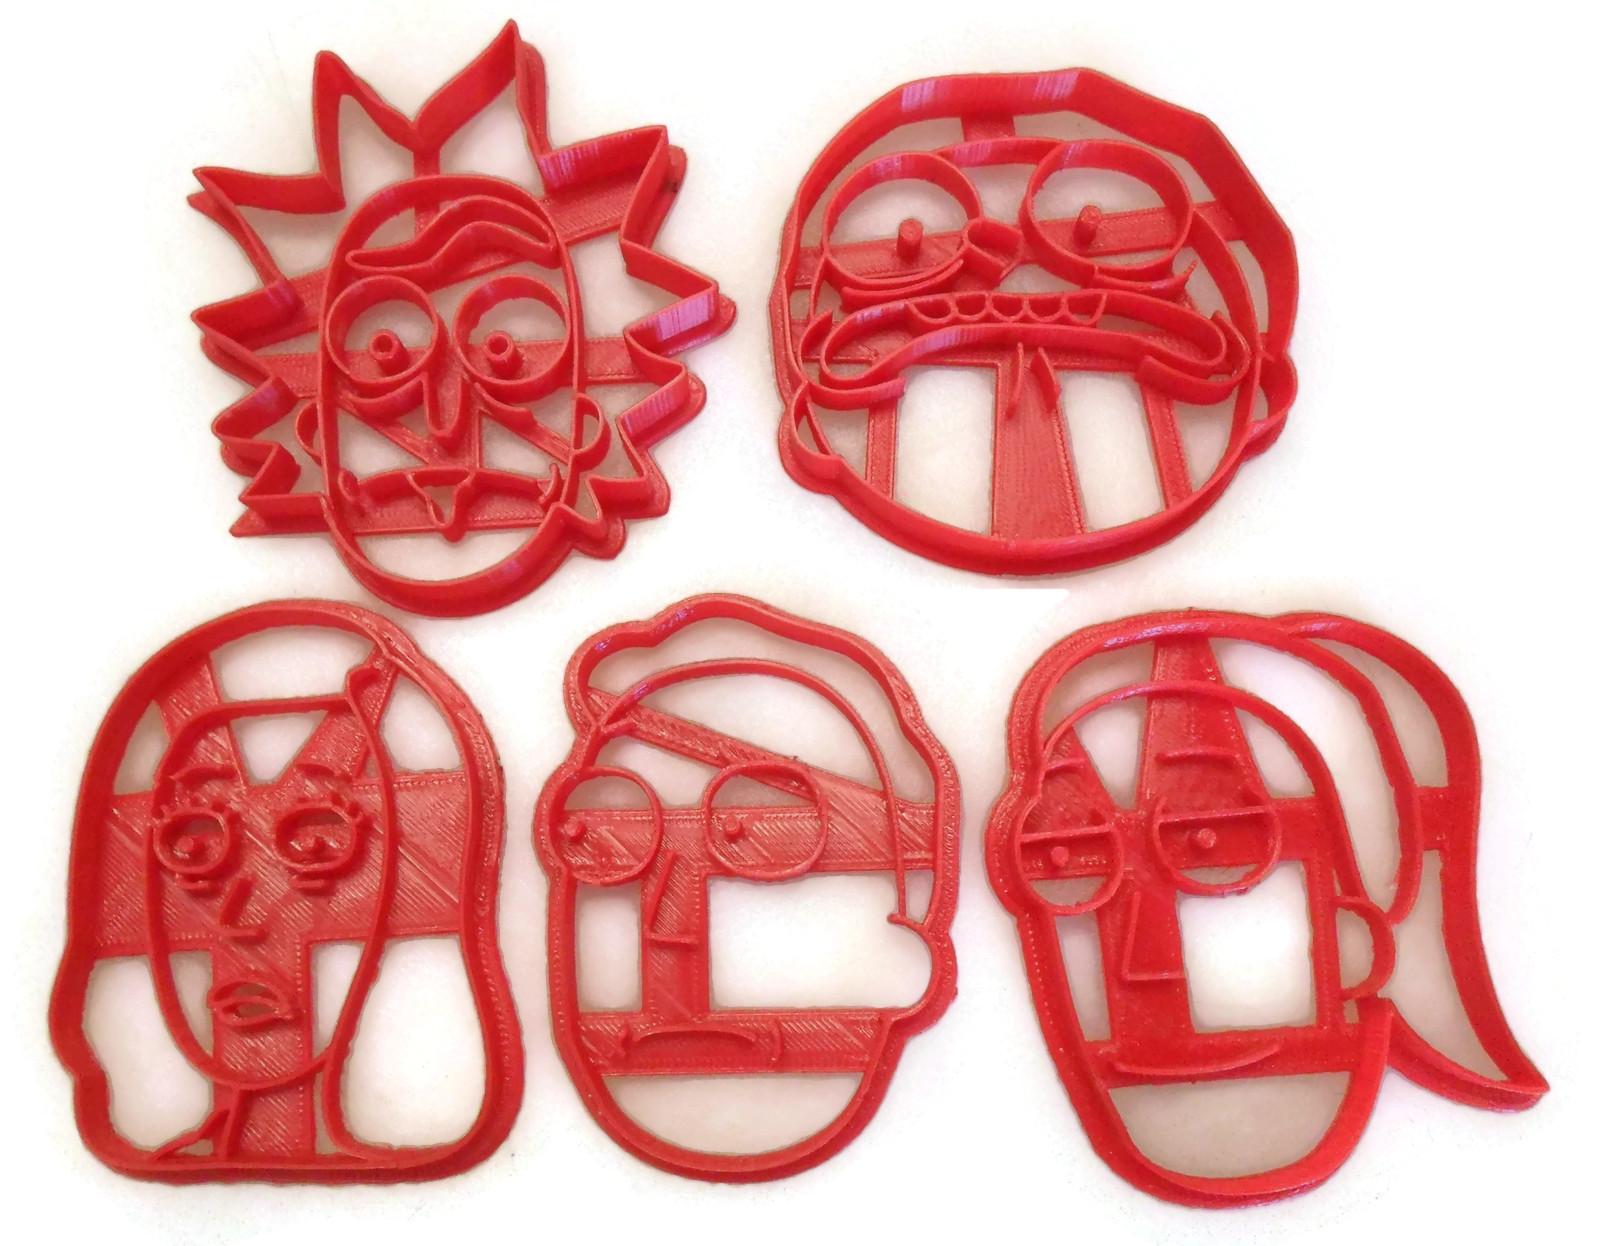 Rick And Morty Family set